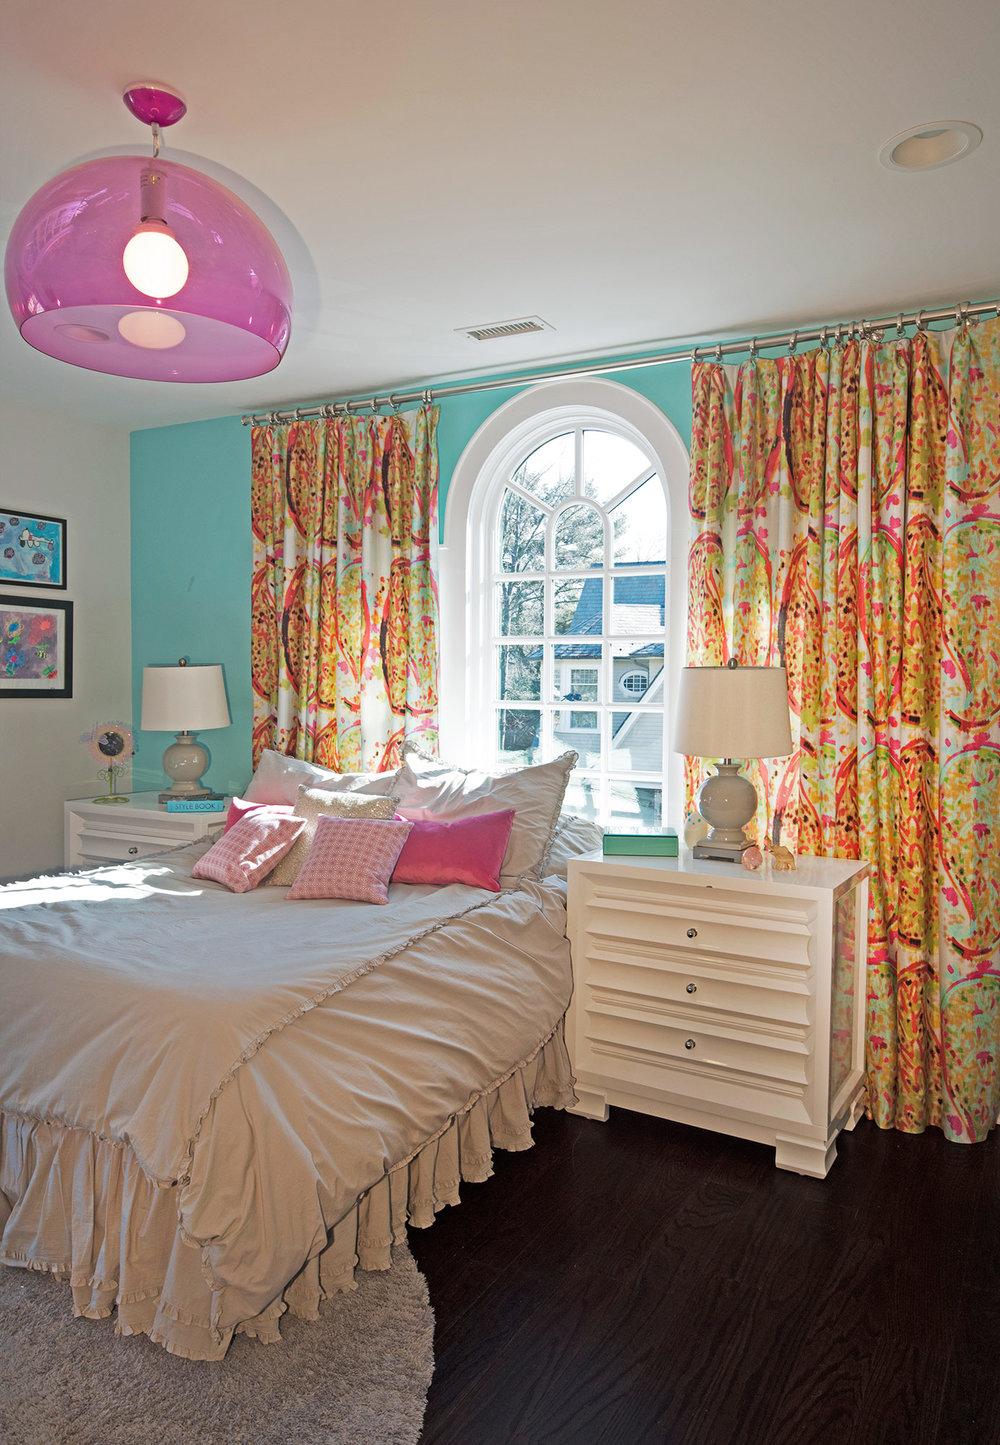 JBM_Interiors_Pinkbedroom.jpg